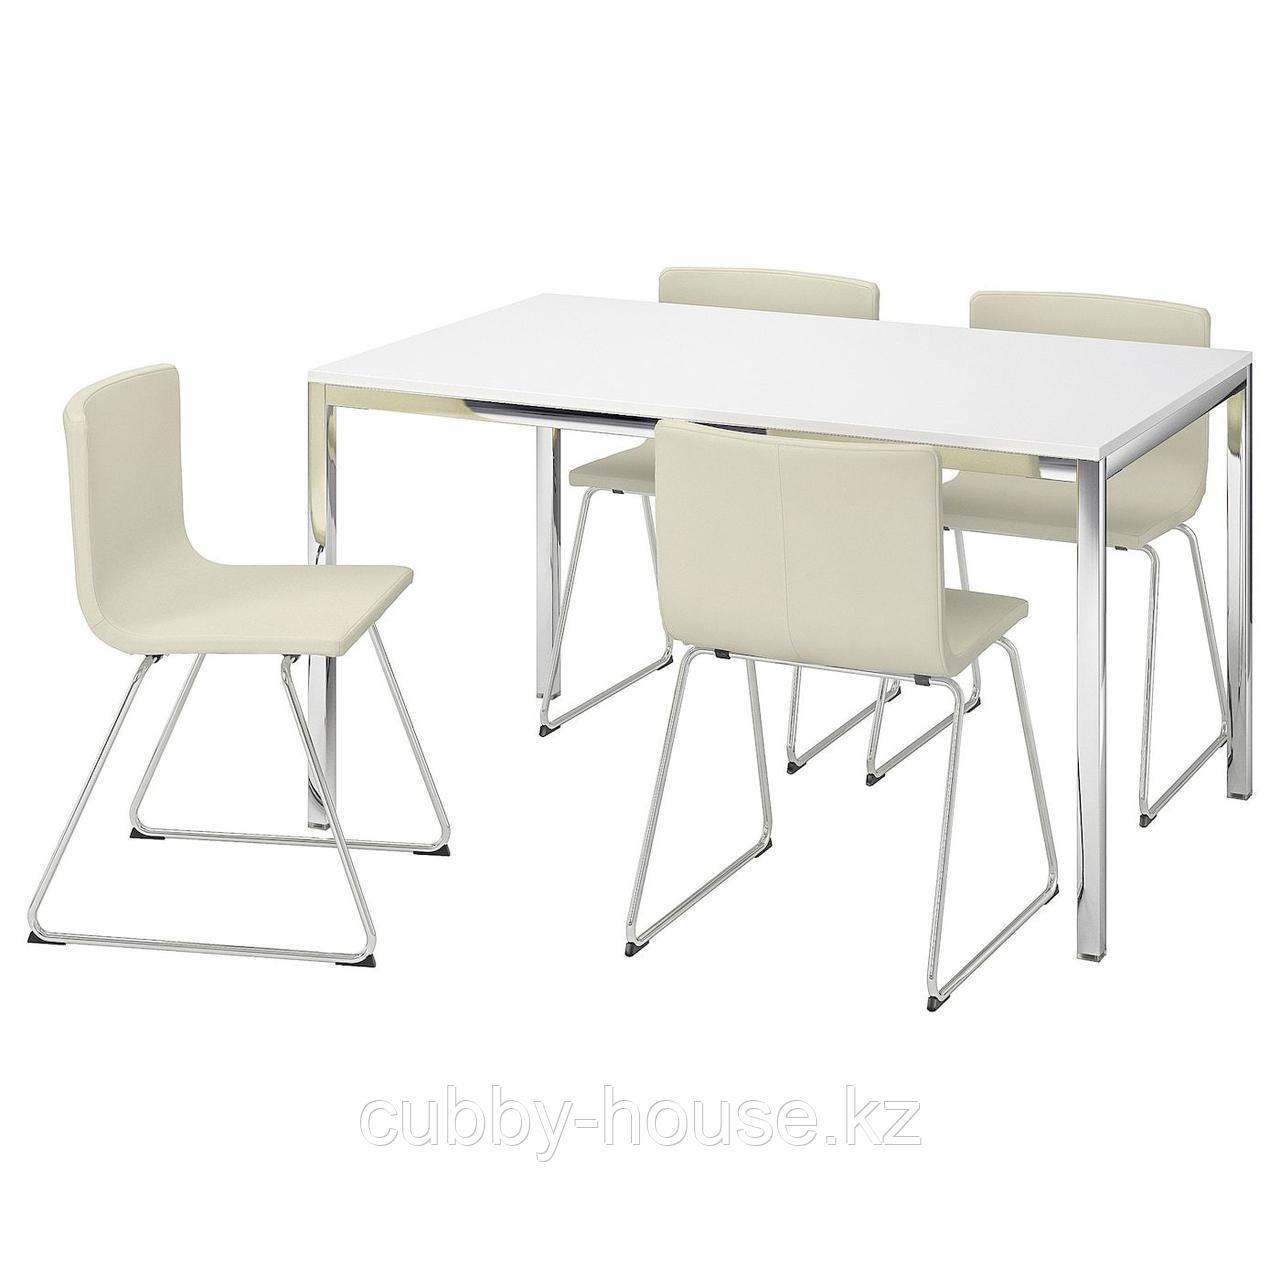 ТОРСБИ / БЕРНГАРД Стол и 4 стула, глянцевый белый, Кават белый, 135 см